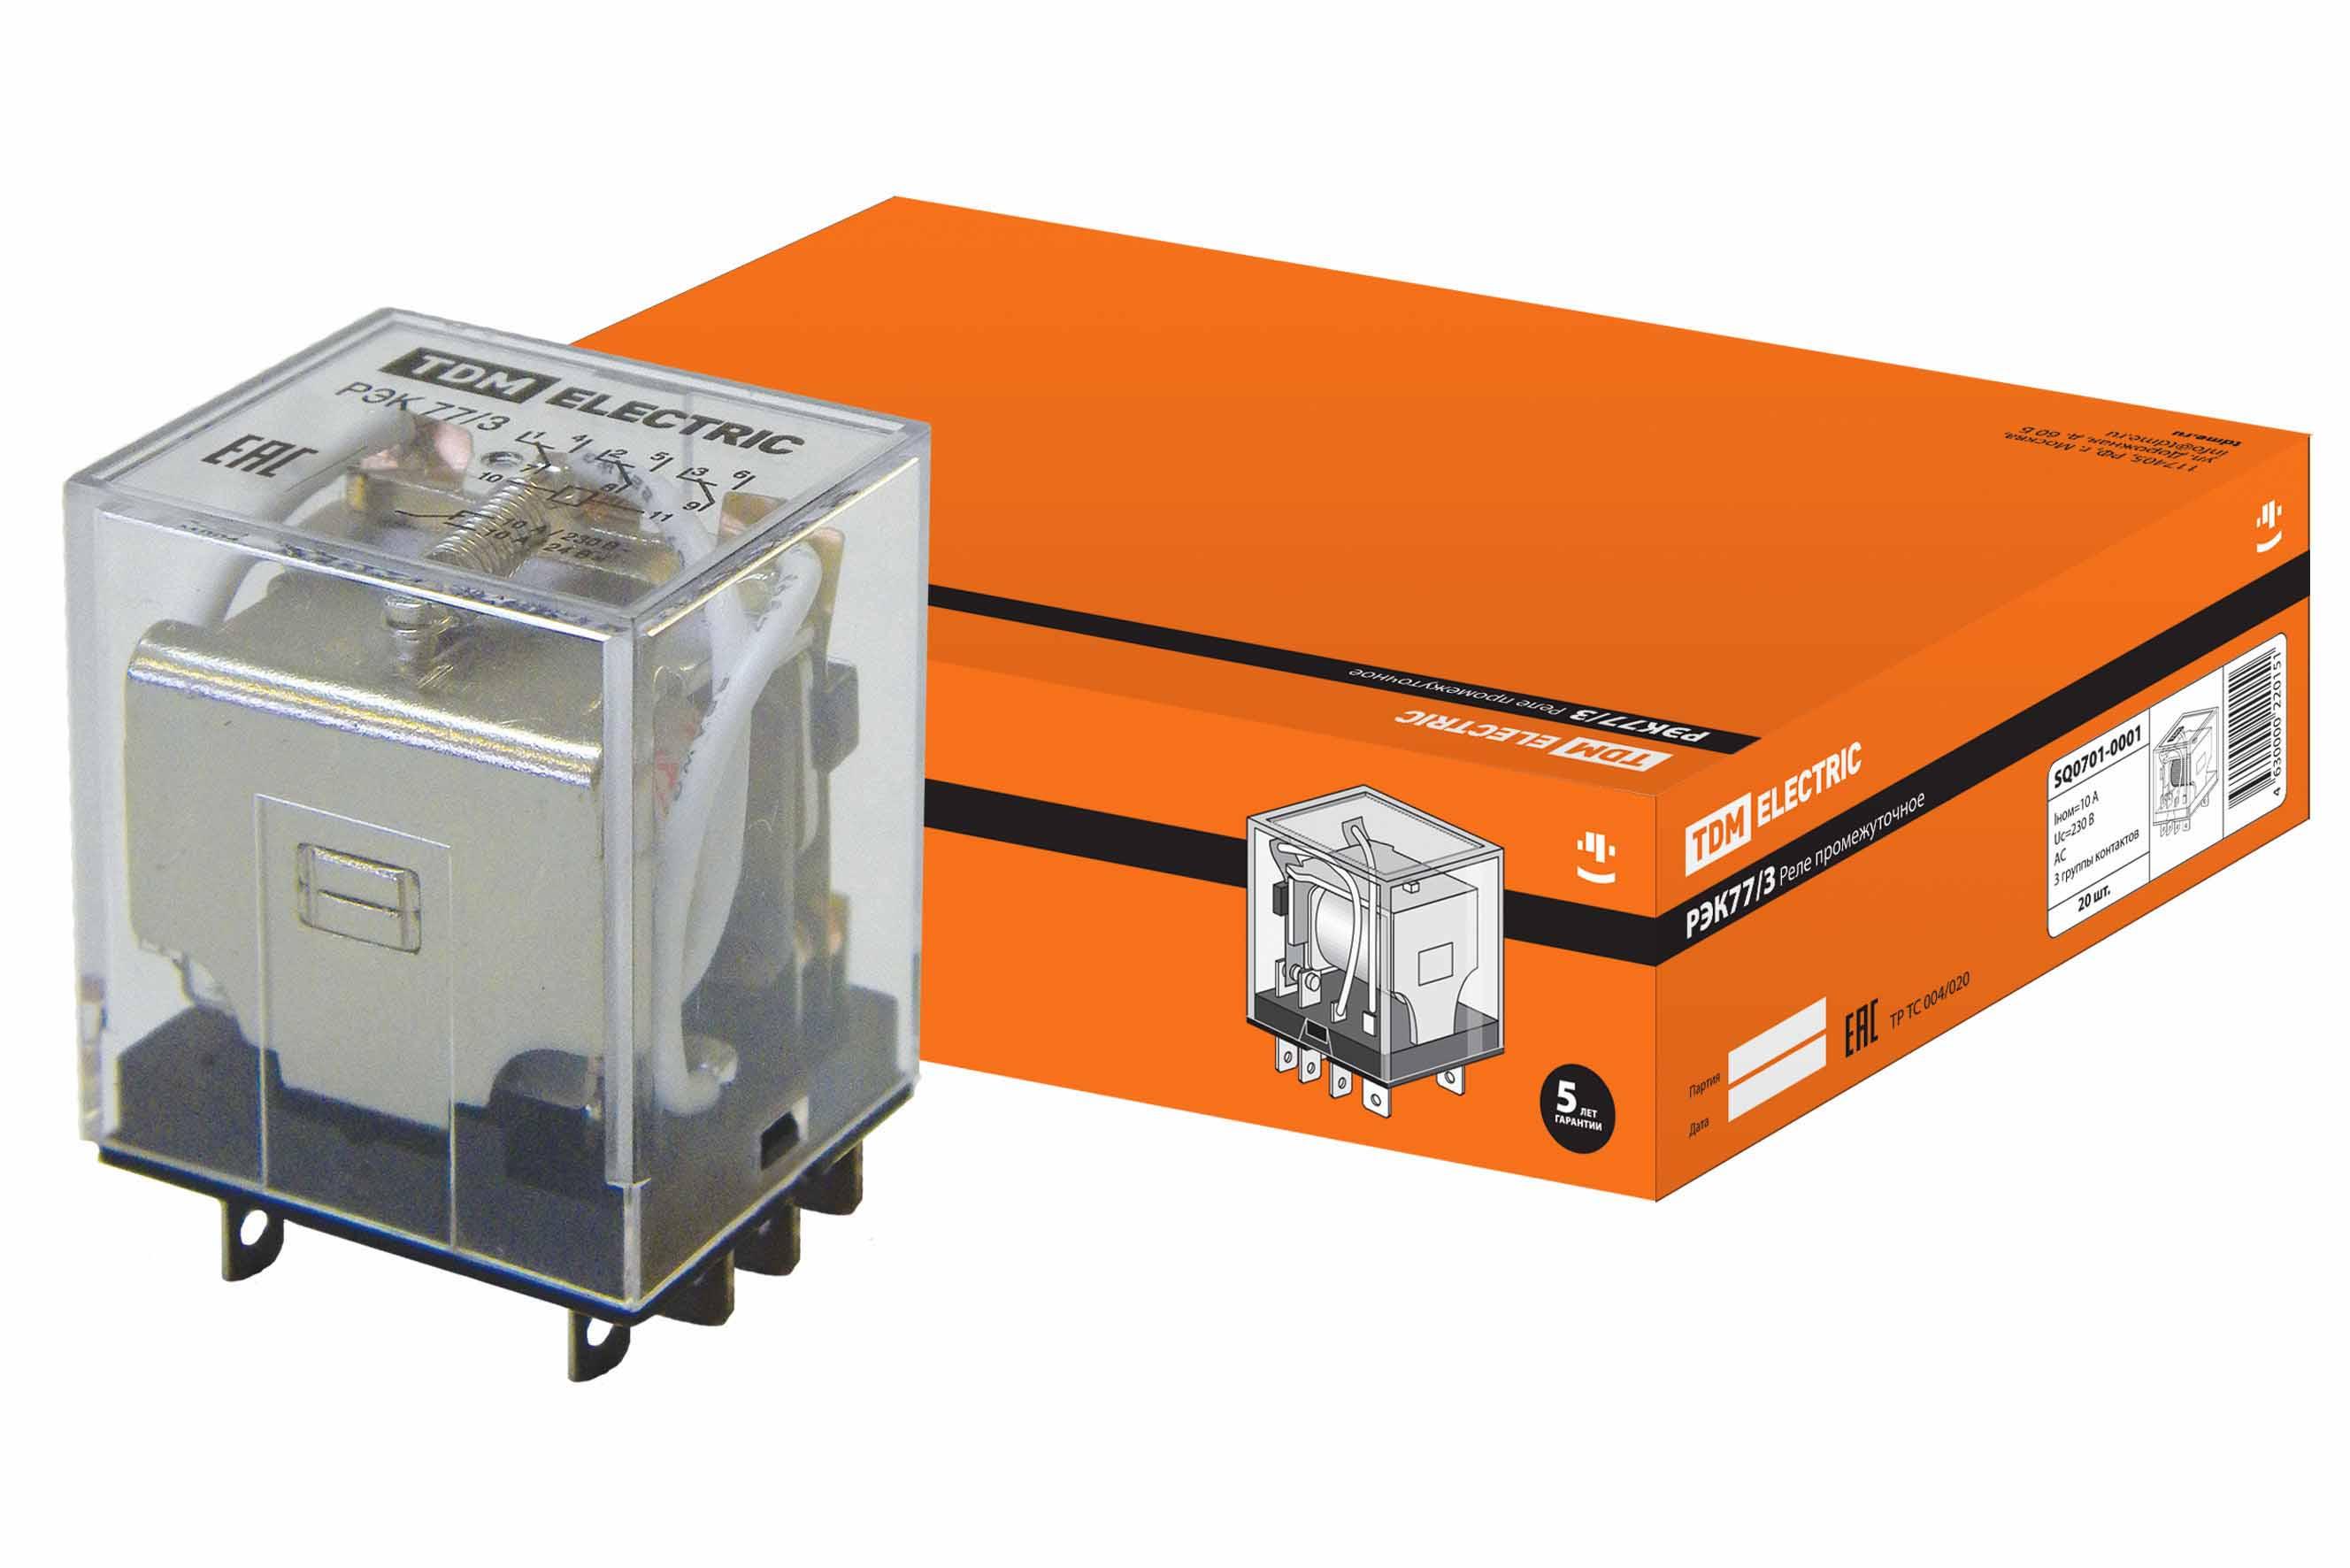 Реле Tdm Sq0701-0001 рамка на 2 поста эра12 графит